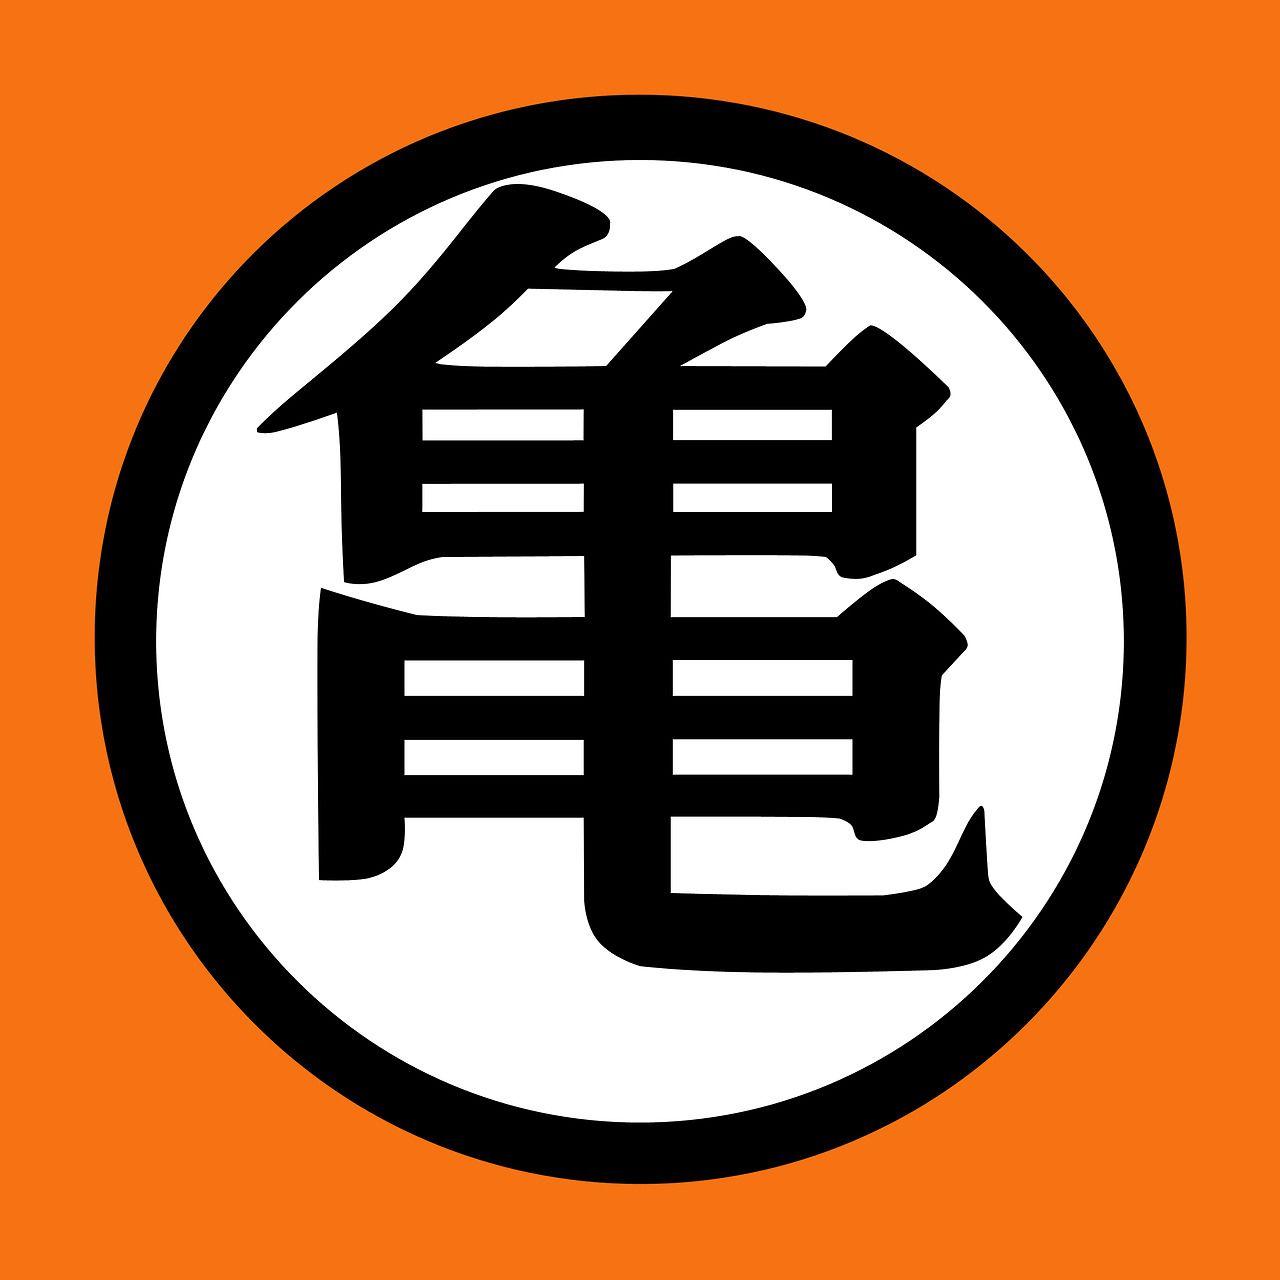 Kame House Emblema Dj Chris Room Pinterest Dragon Ball